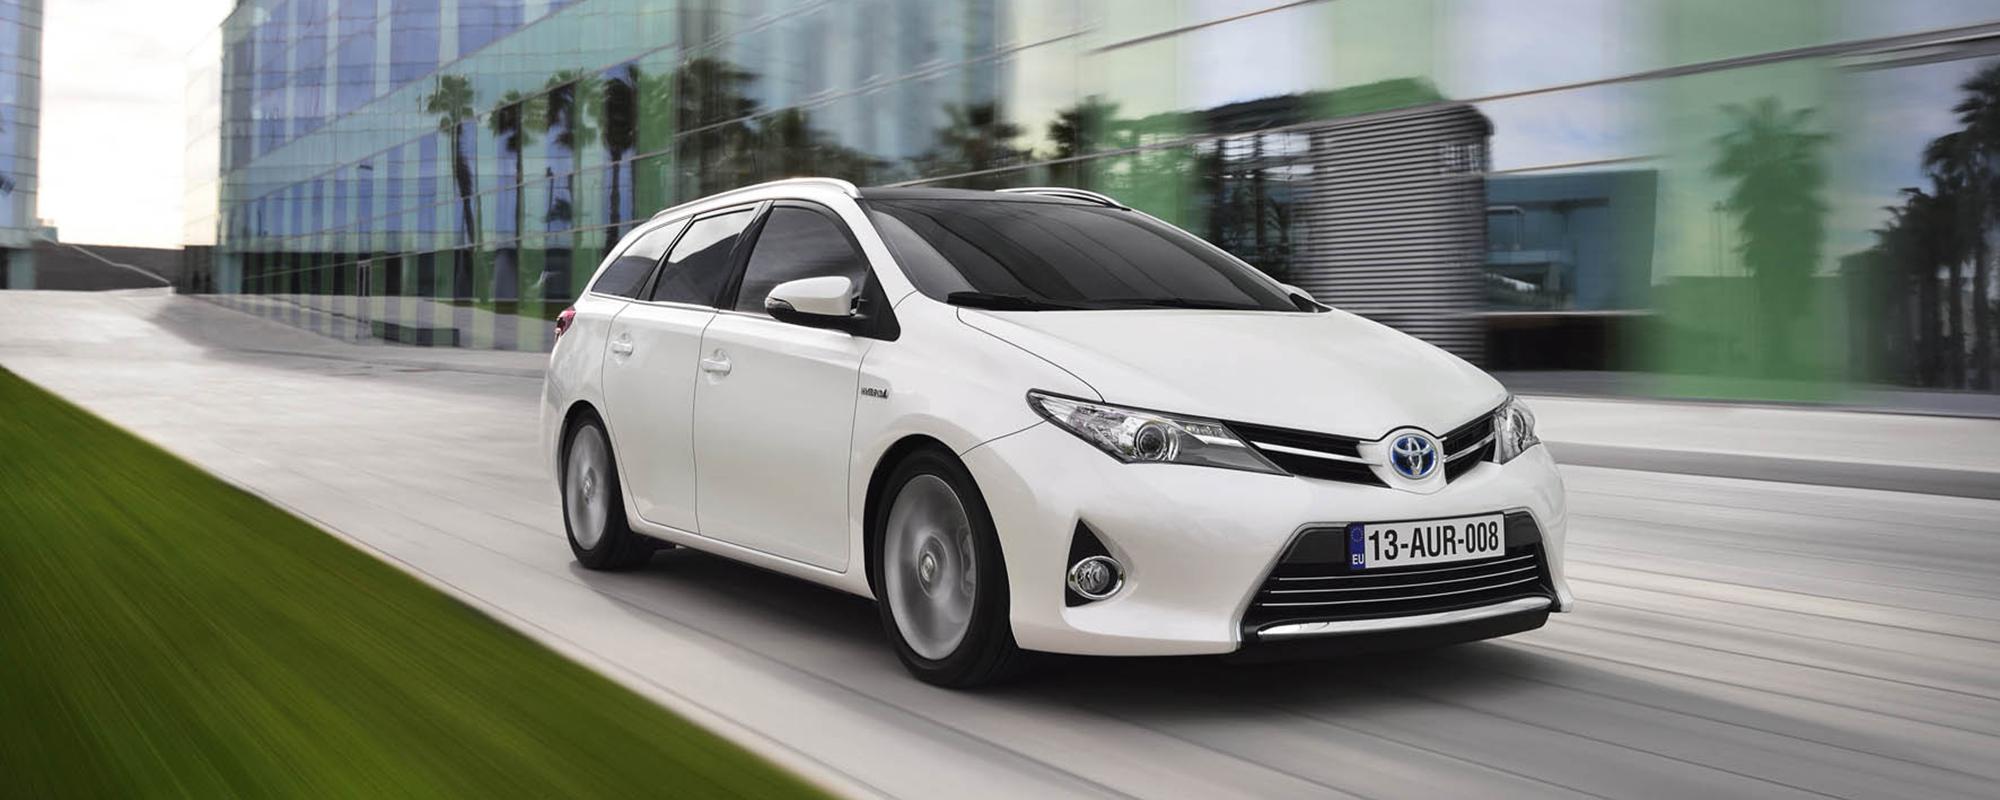 AutoBild: 'Toyota nummer 1 in kwaliteit en betrouwbaarheid'